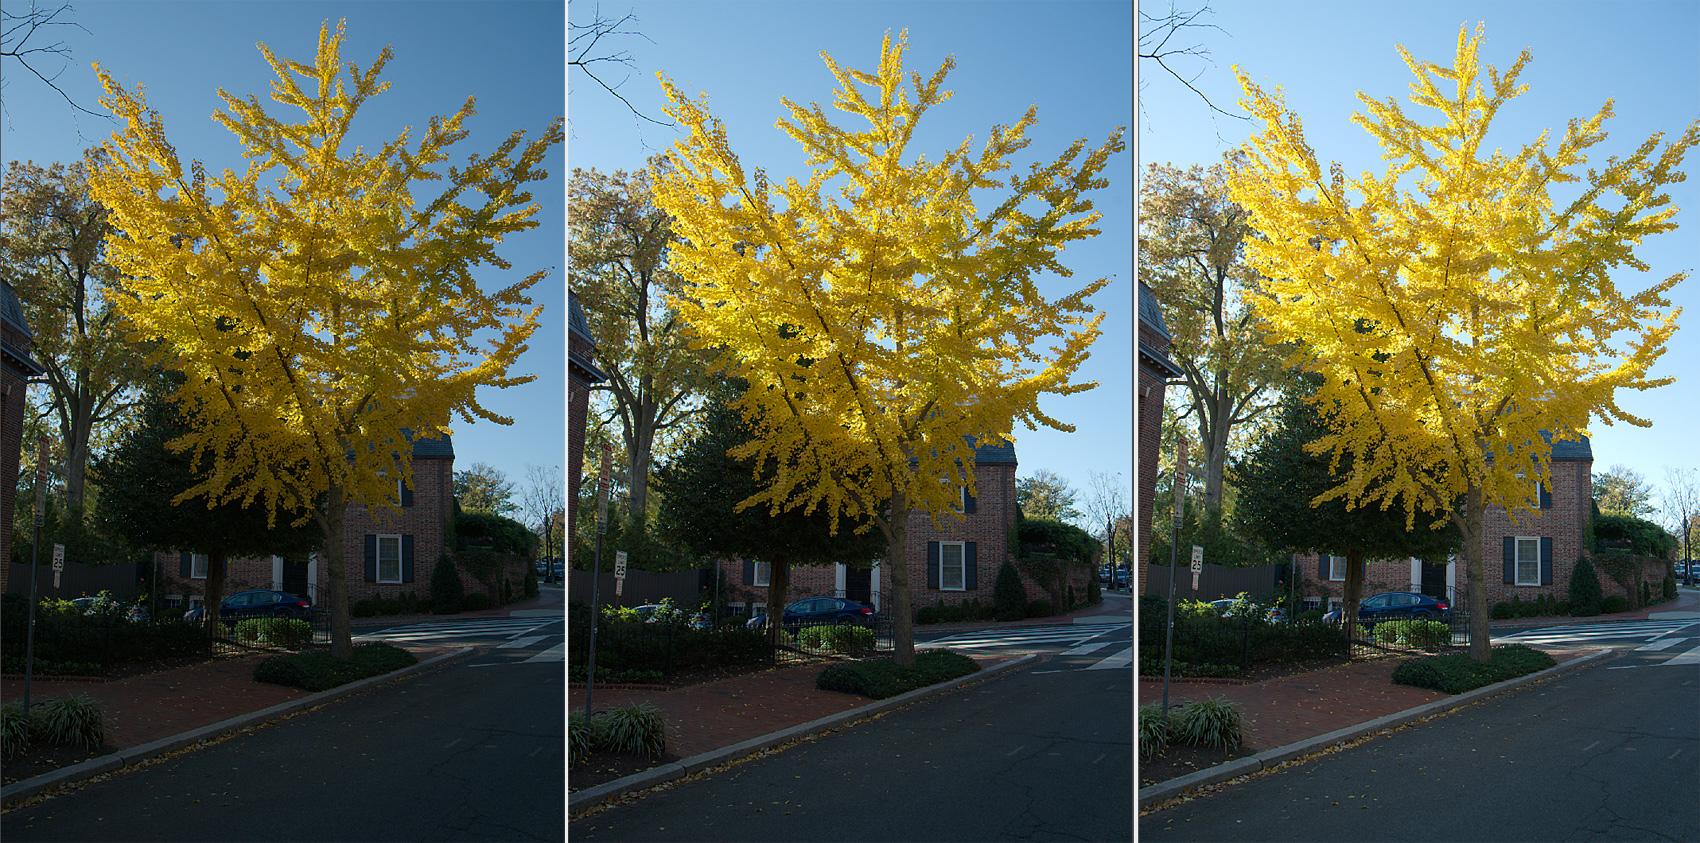 bracketed-exposures-photo-editing-sample